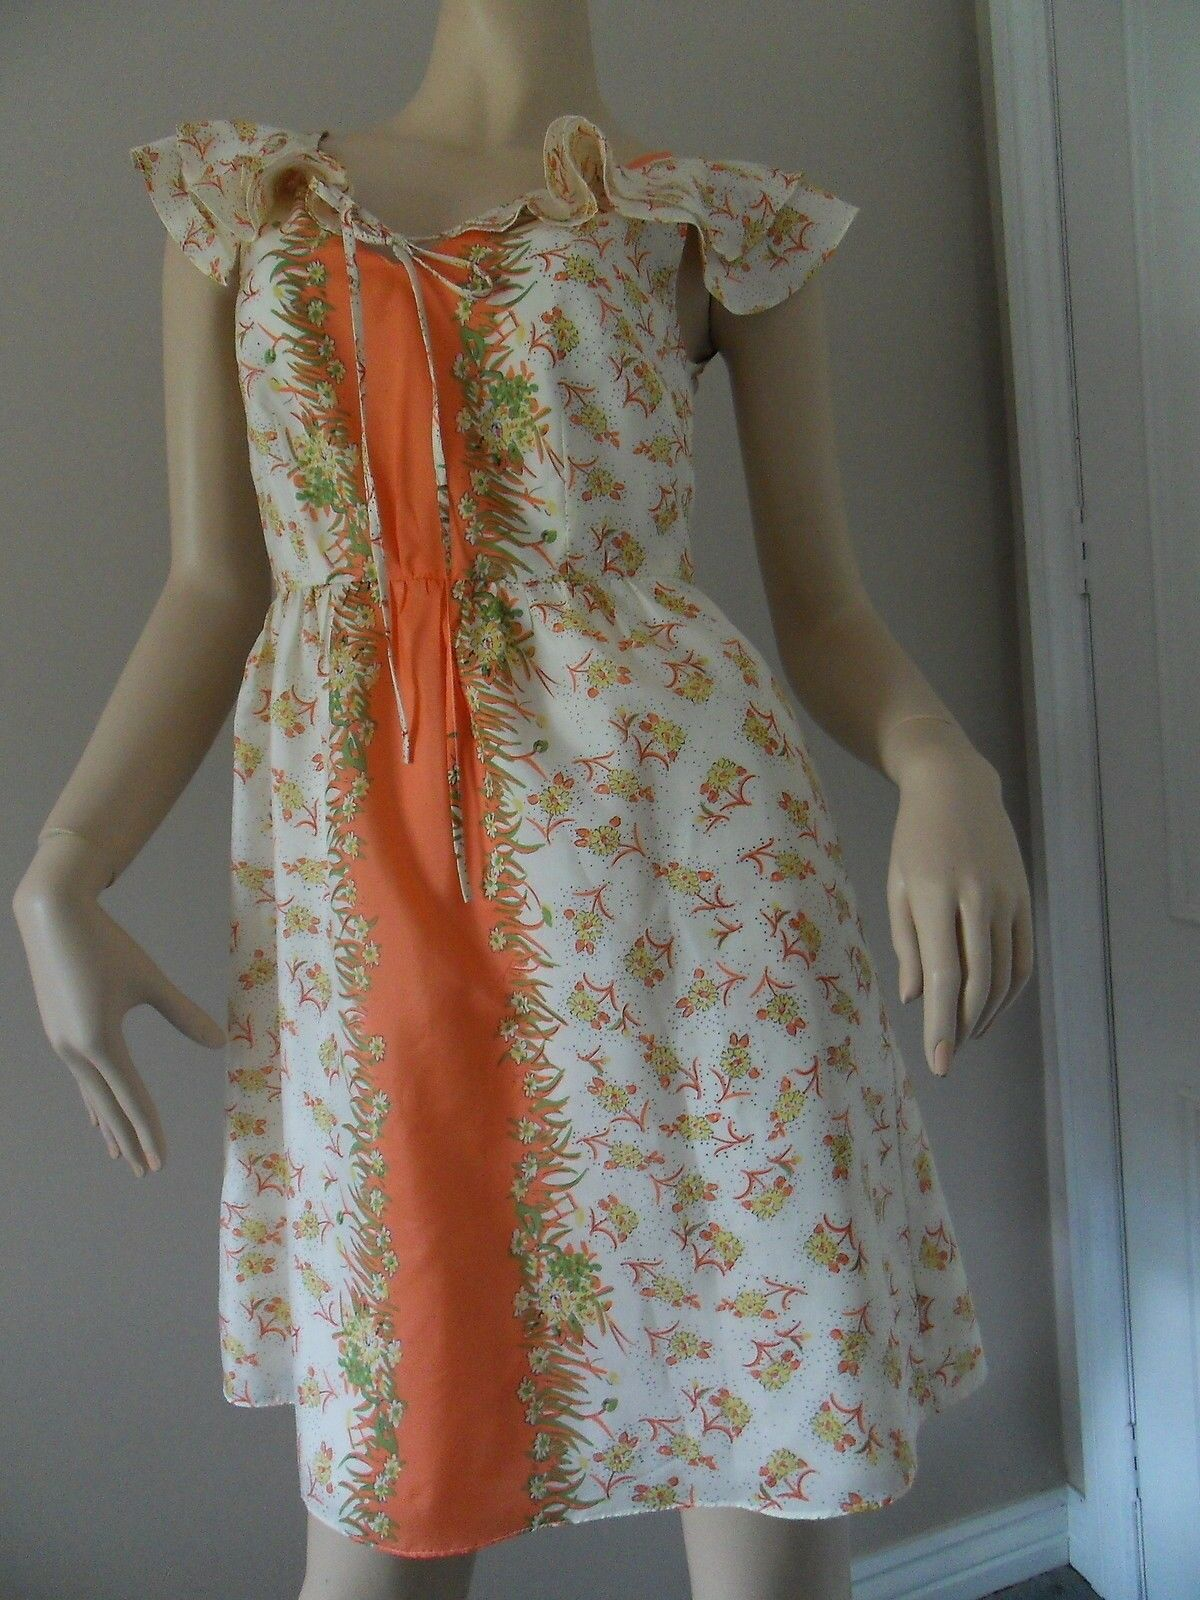 FLEUR WOOD Orange cream floral print 100% silk dress Größe 6 EUC